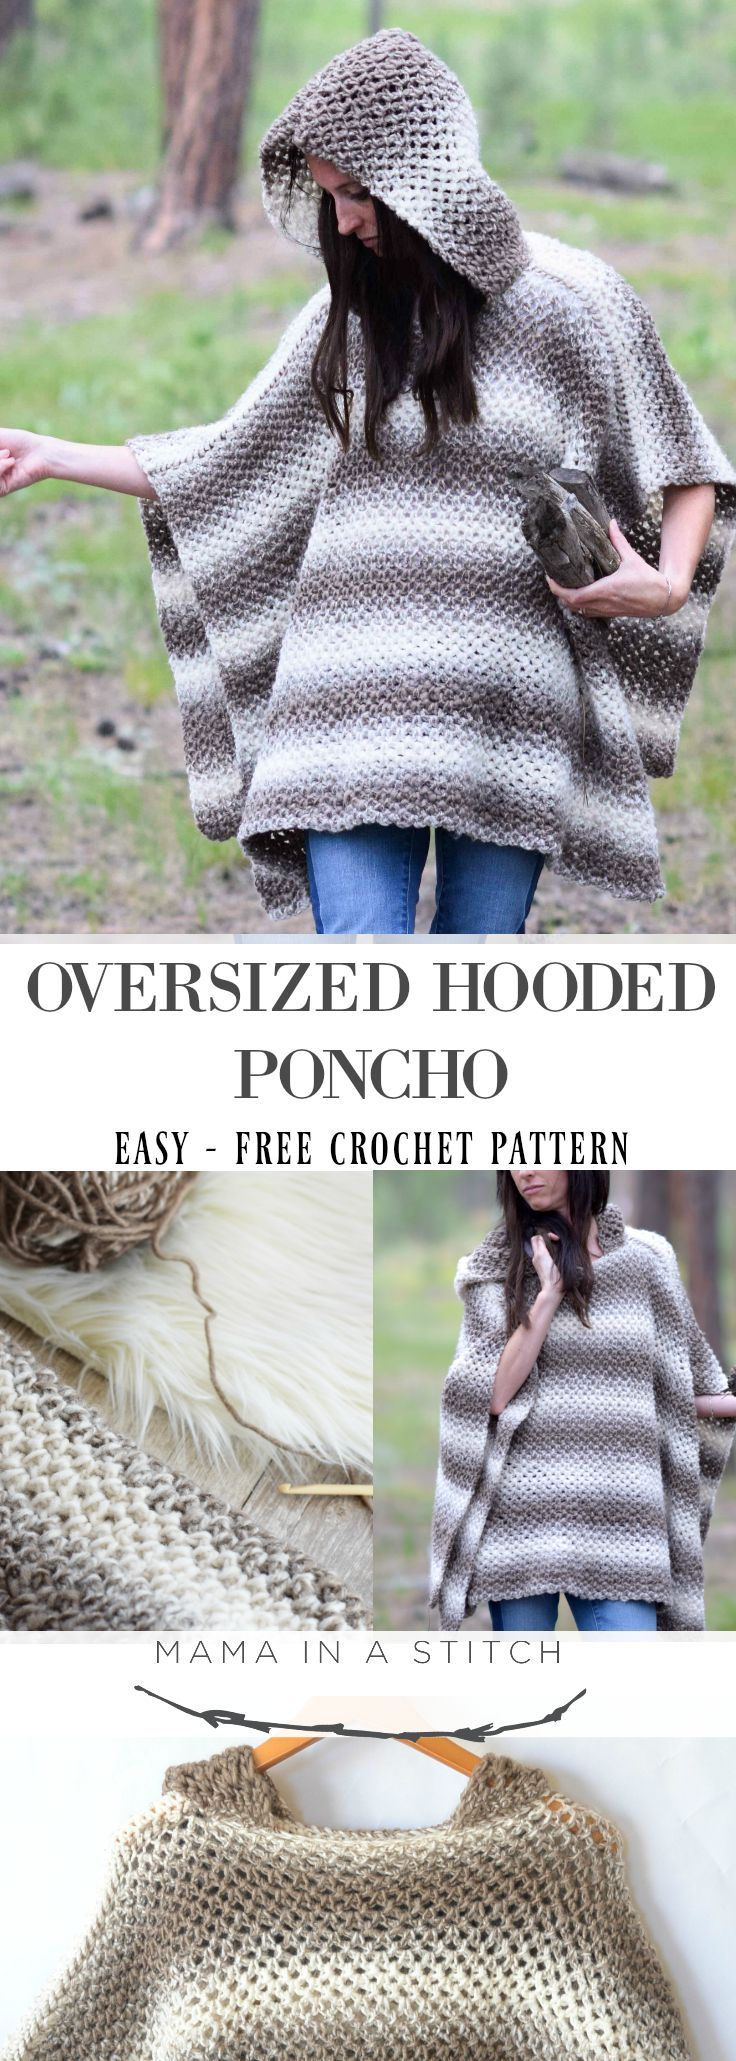 Driftwood Oversized Crochet Hooded Poncho Pattern   tejidos ...